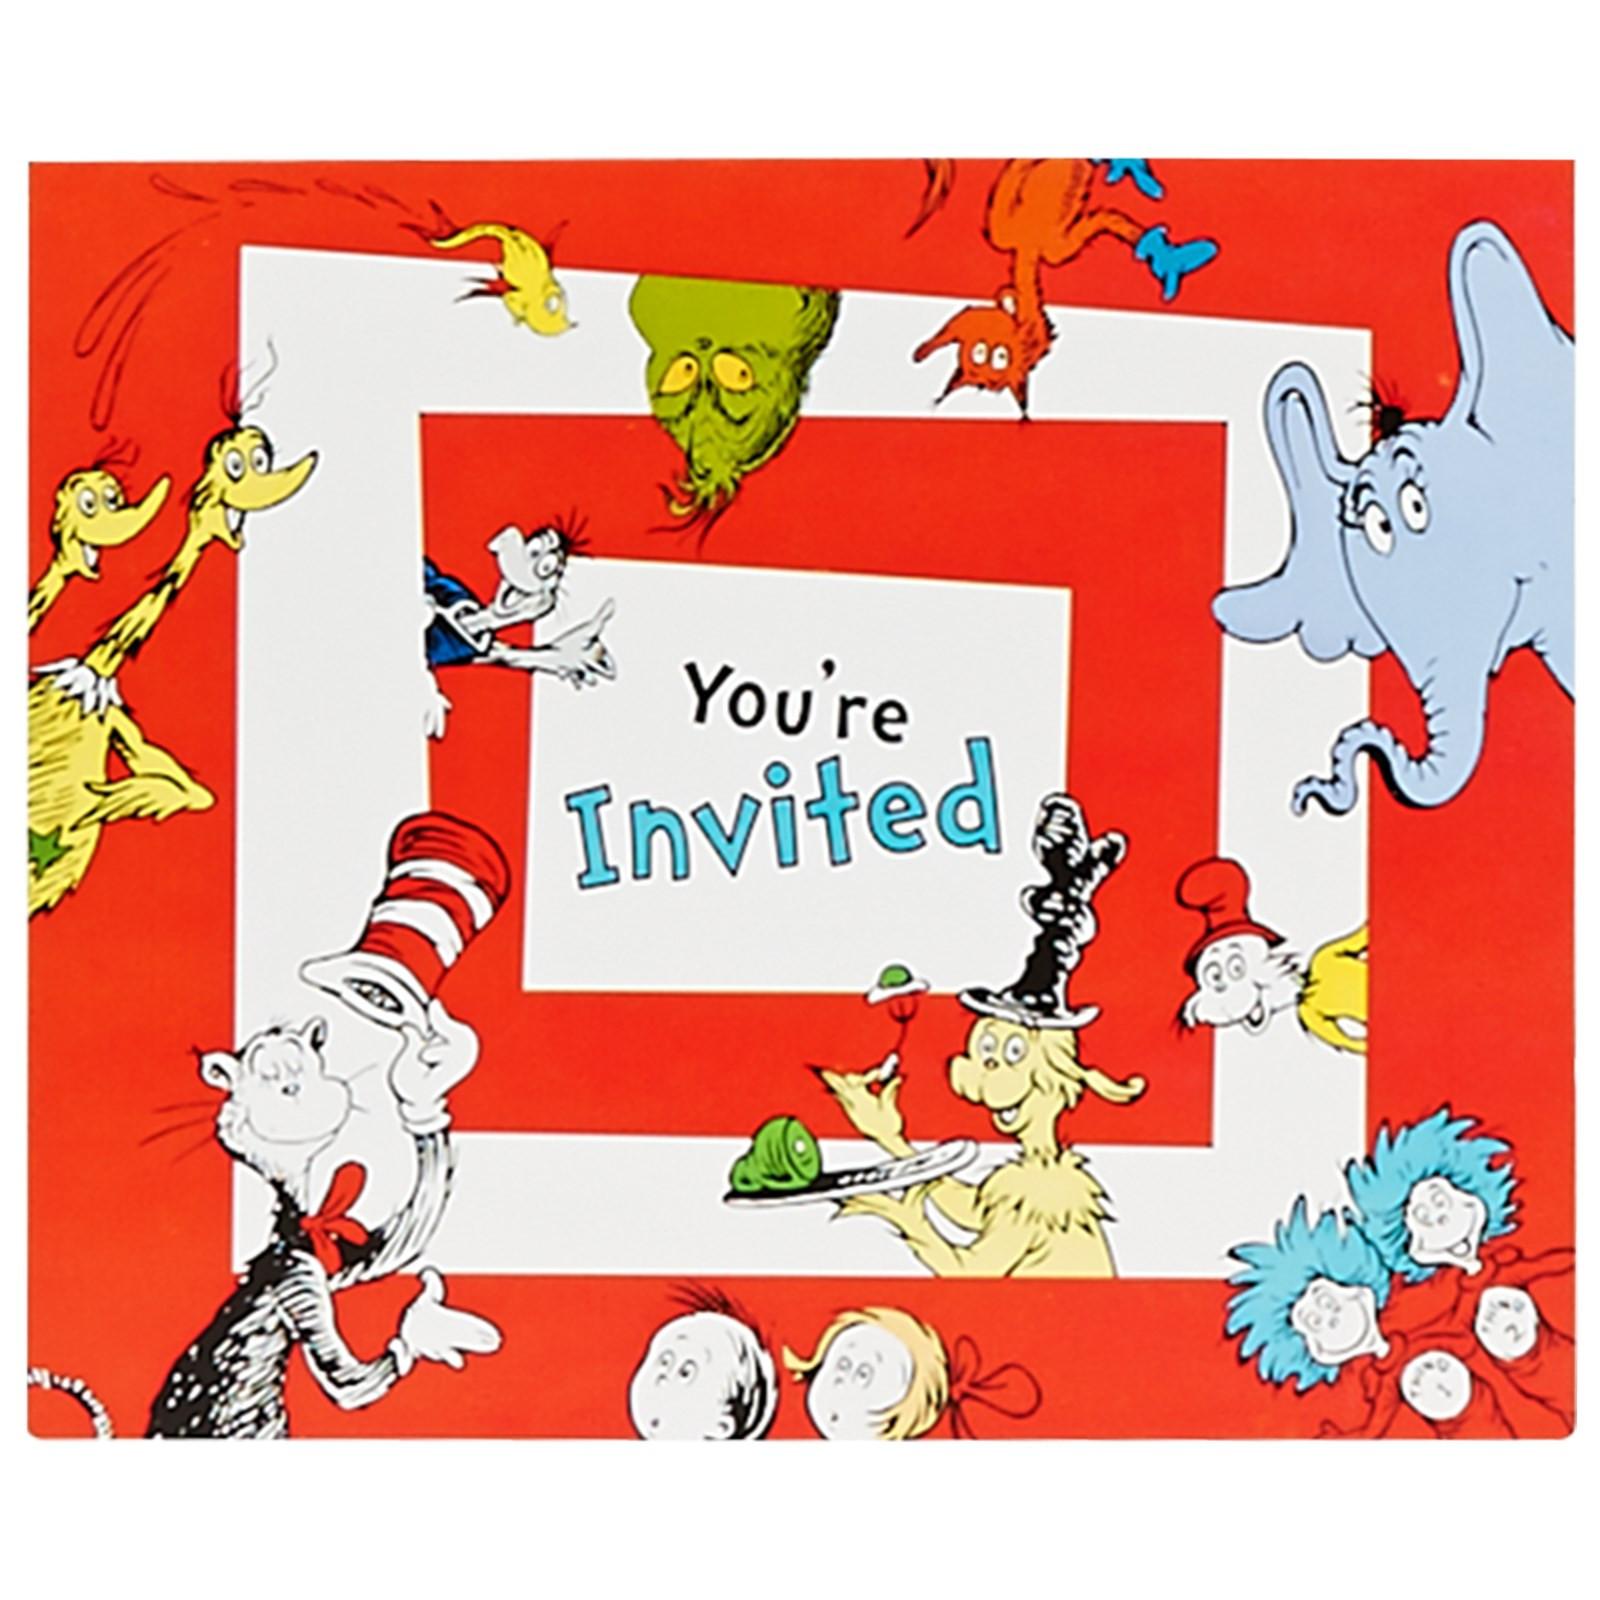 Best ideas about Dr Seuss 1st Birthday Invitations . Save or Pin Dr Seuss 1st Birthday Invitations Now.